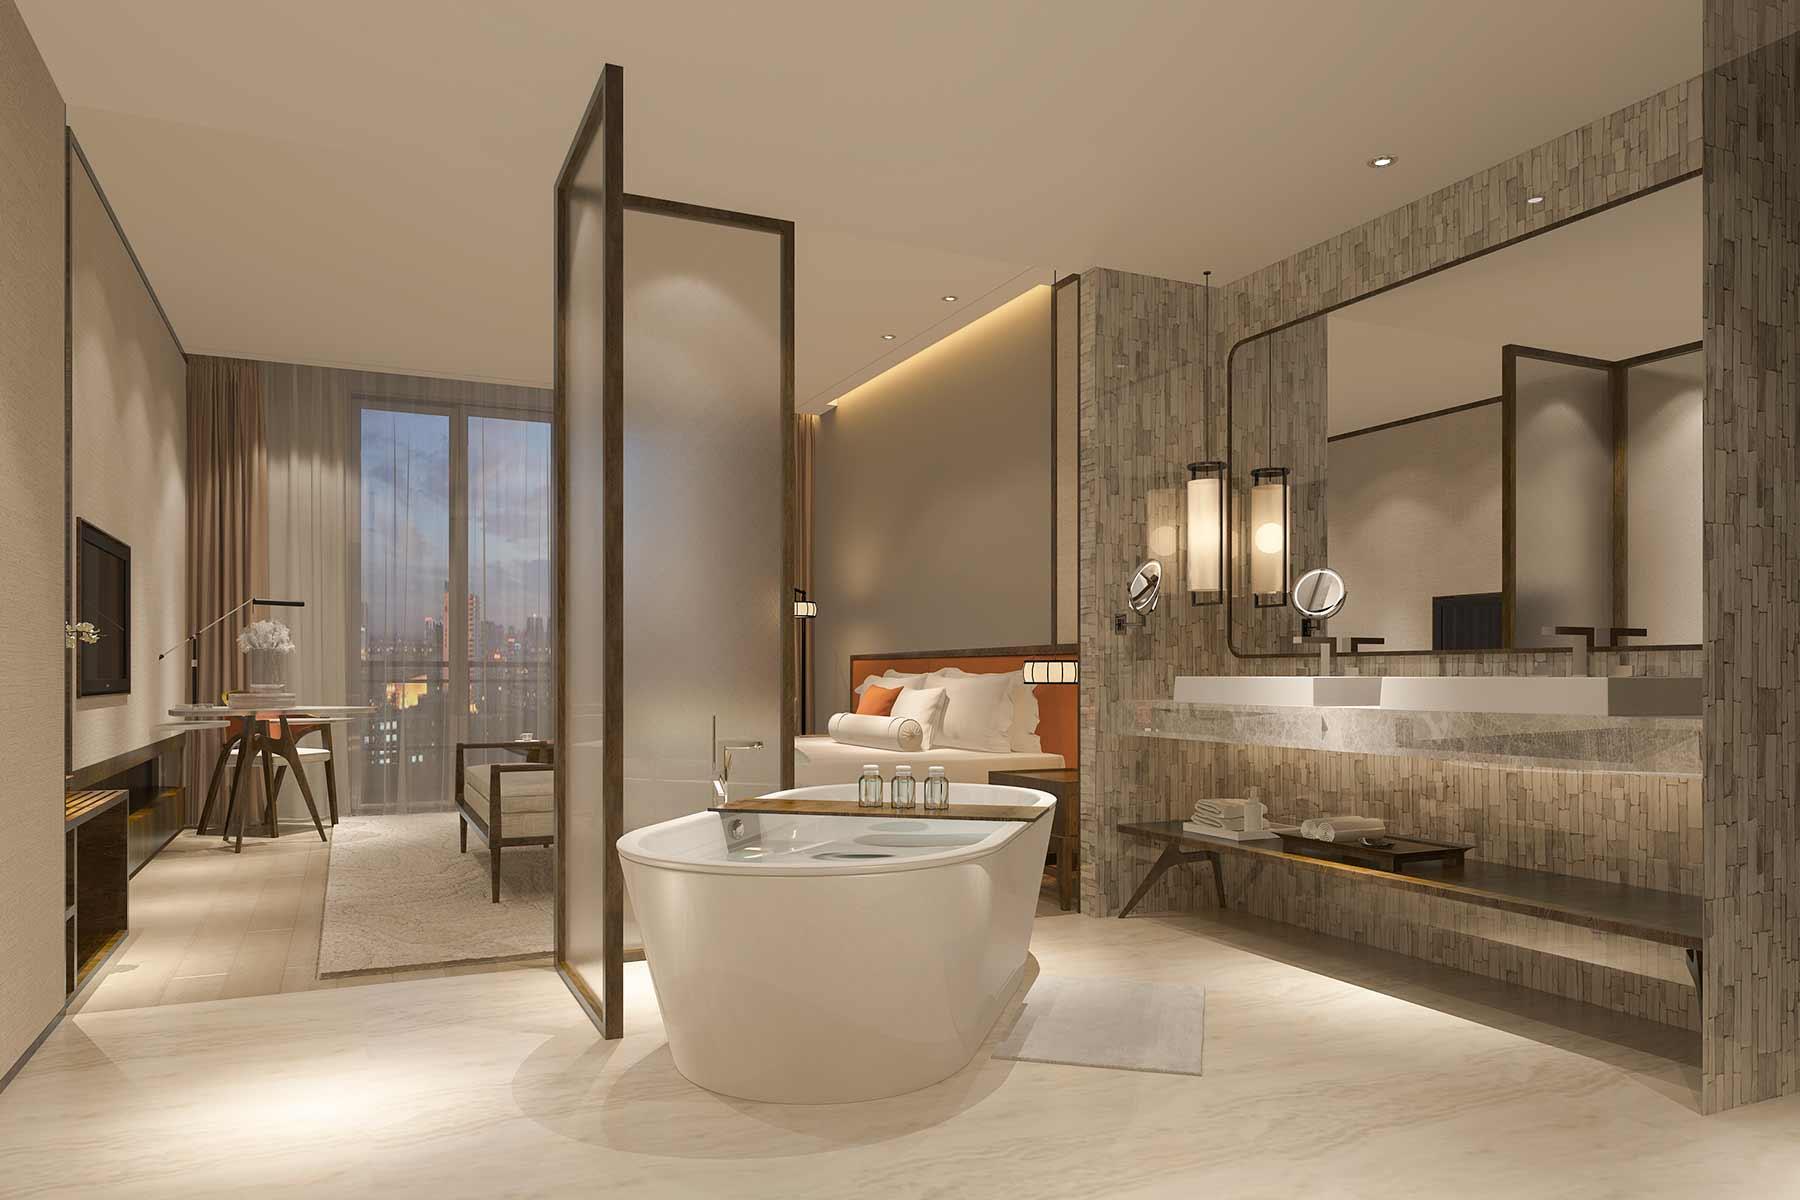 stunning luxury hotel bath escape respite replenishments linens luxe towels